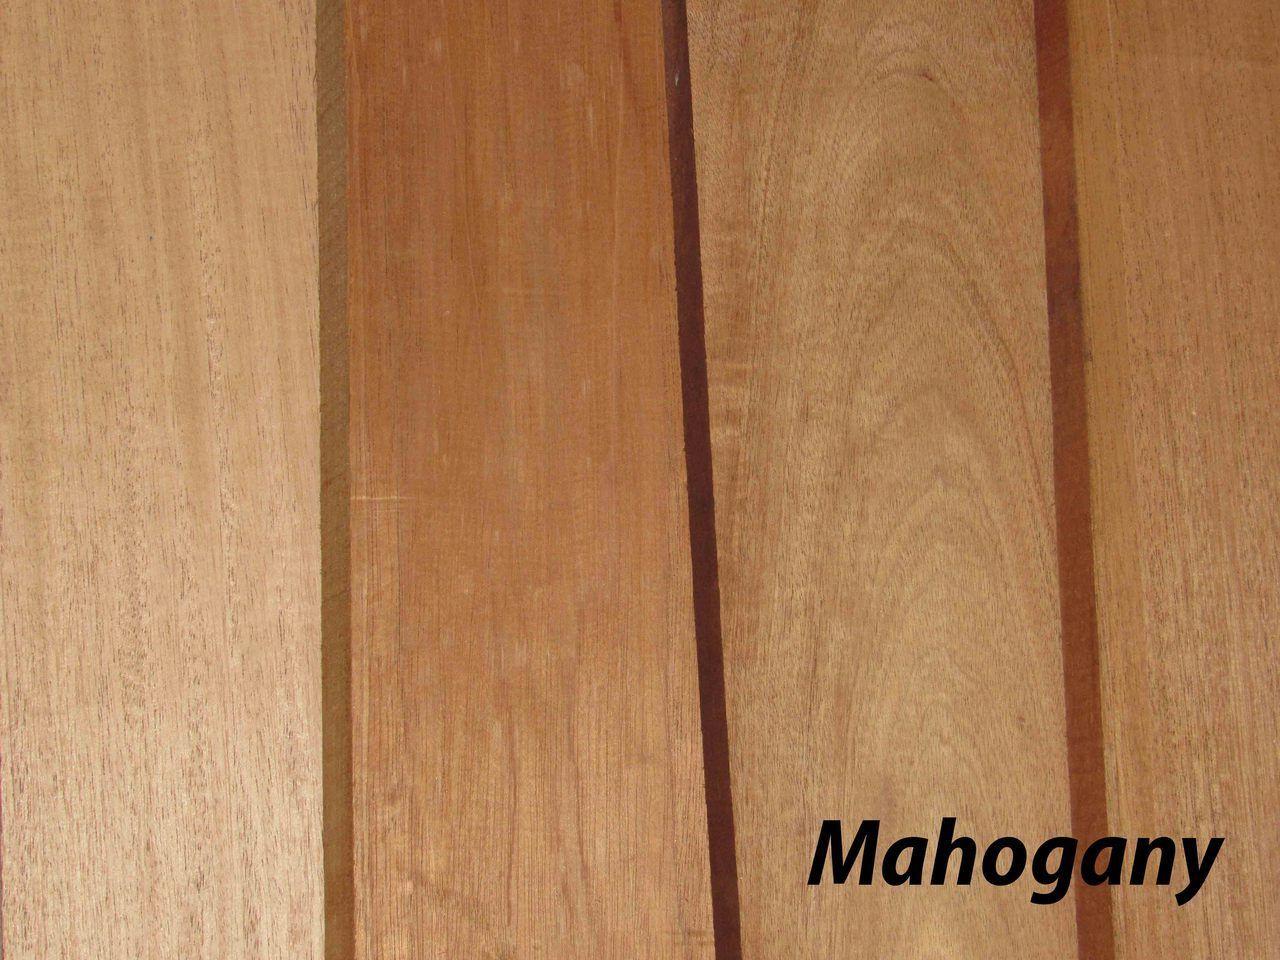 Mahogany Hardwood S2s1e Hardwood Wood Store Wood Shutters